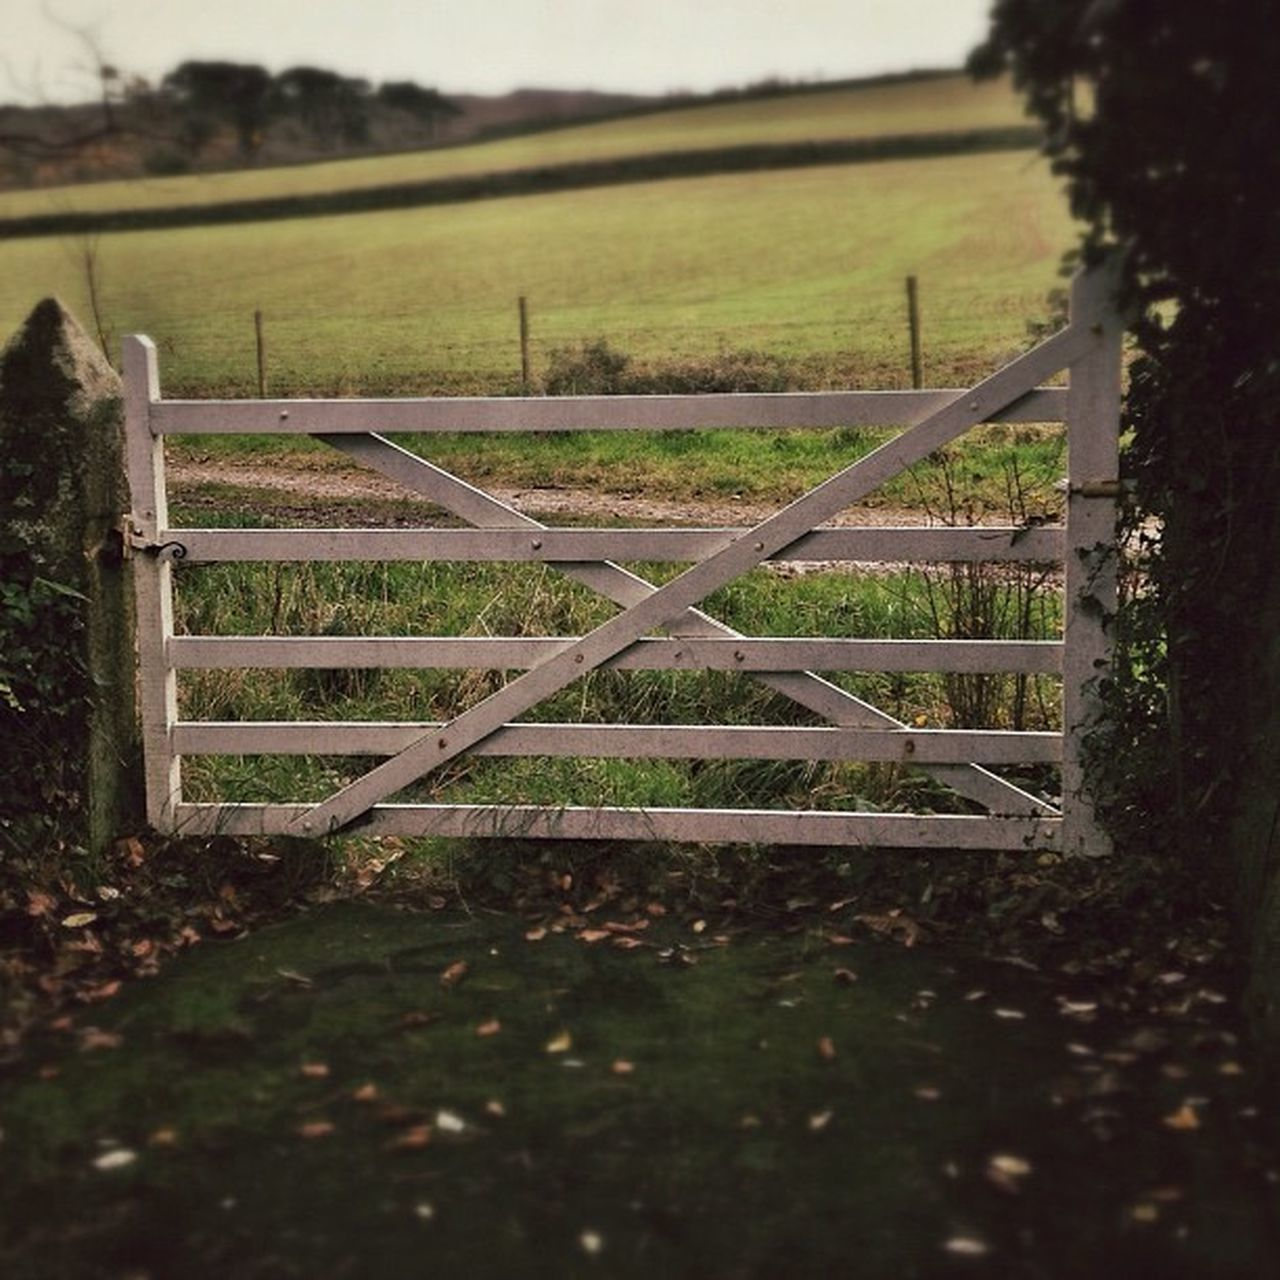 Gateway... #gate #field #improvedimage Field Gate Improvedimage